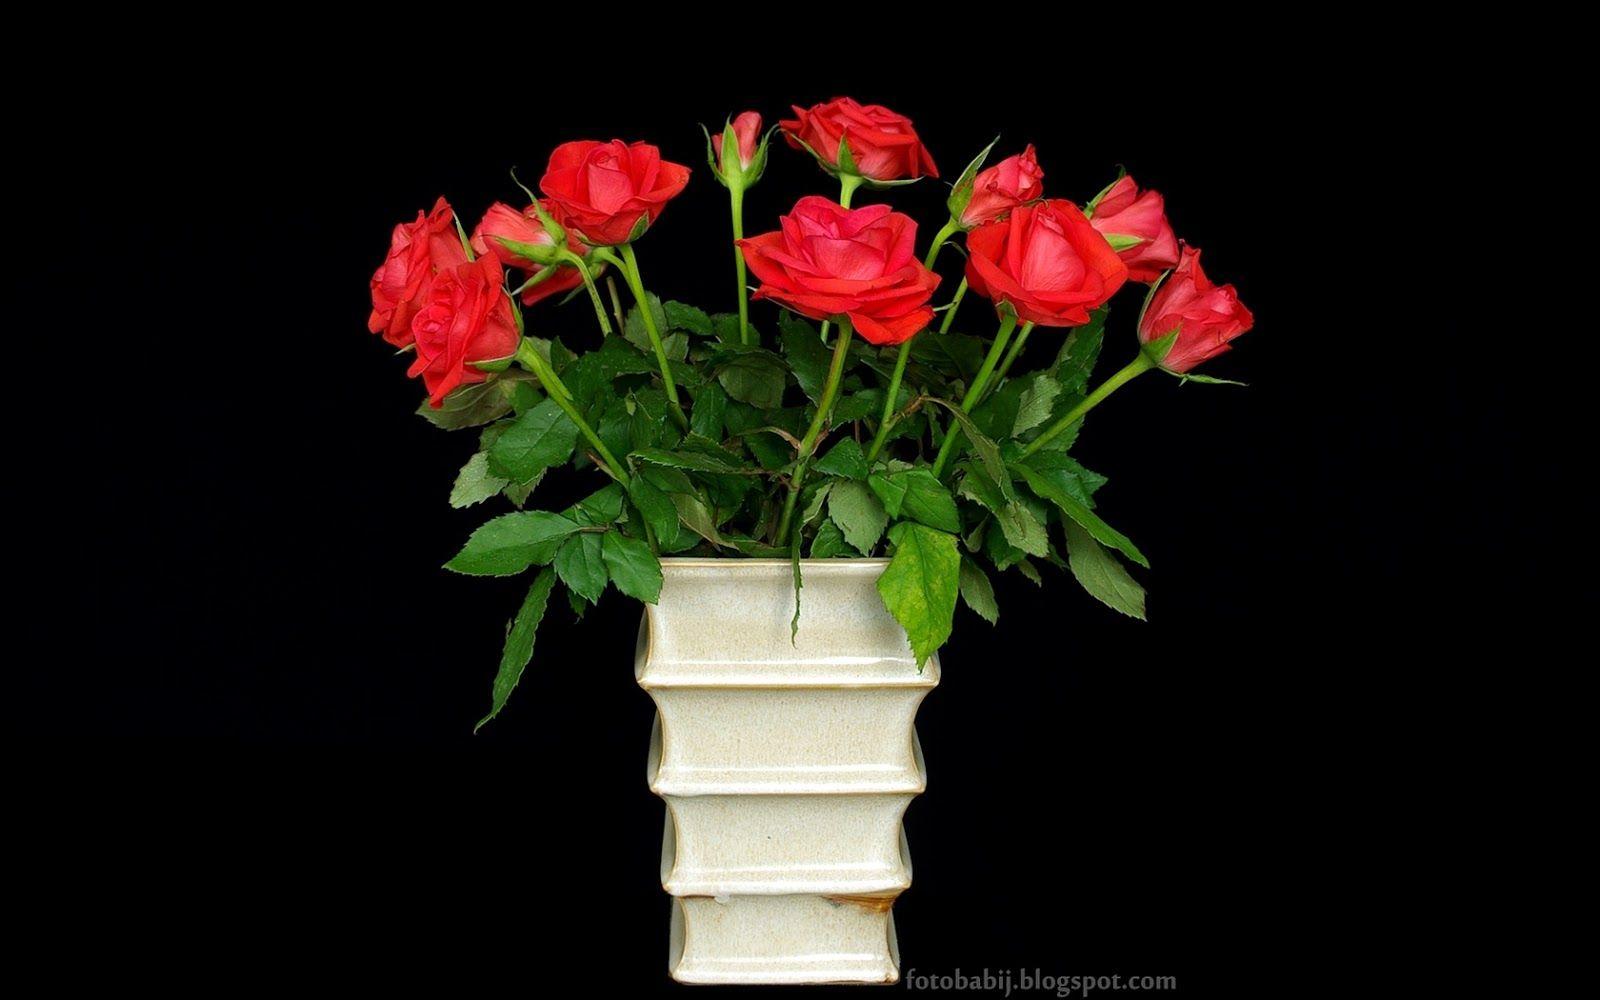 Tapety Na Pulpit 4k Ultra Hd Full Hd I Inne Rozdzielczosci Karminowe Roze Bukiet Plants